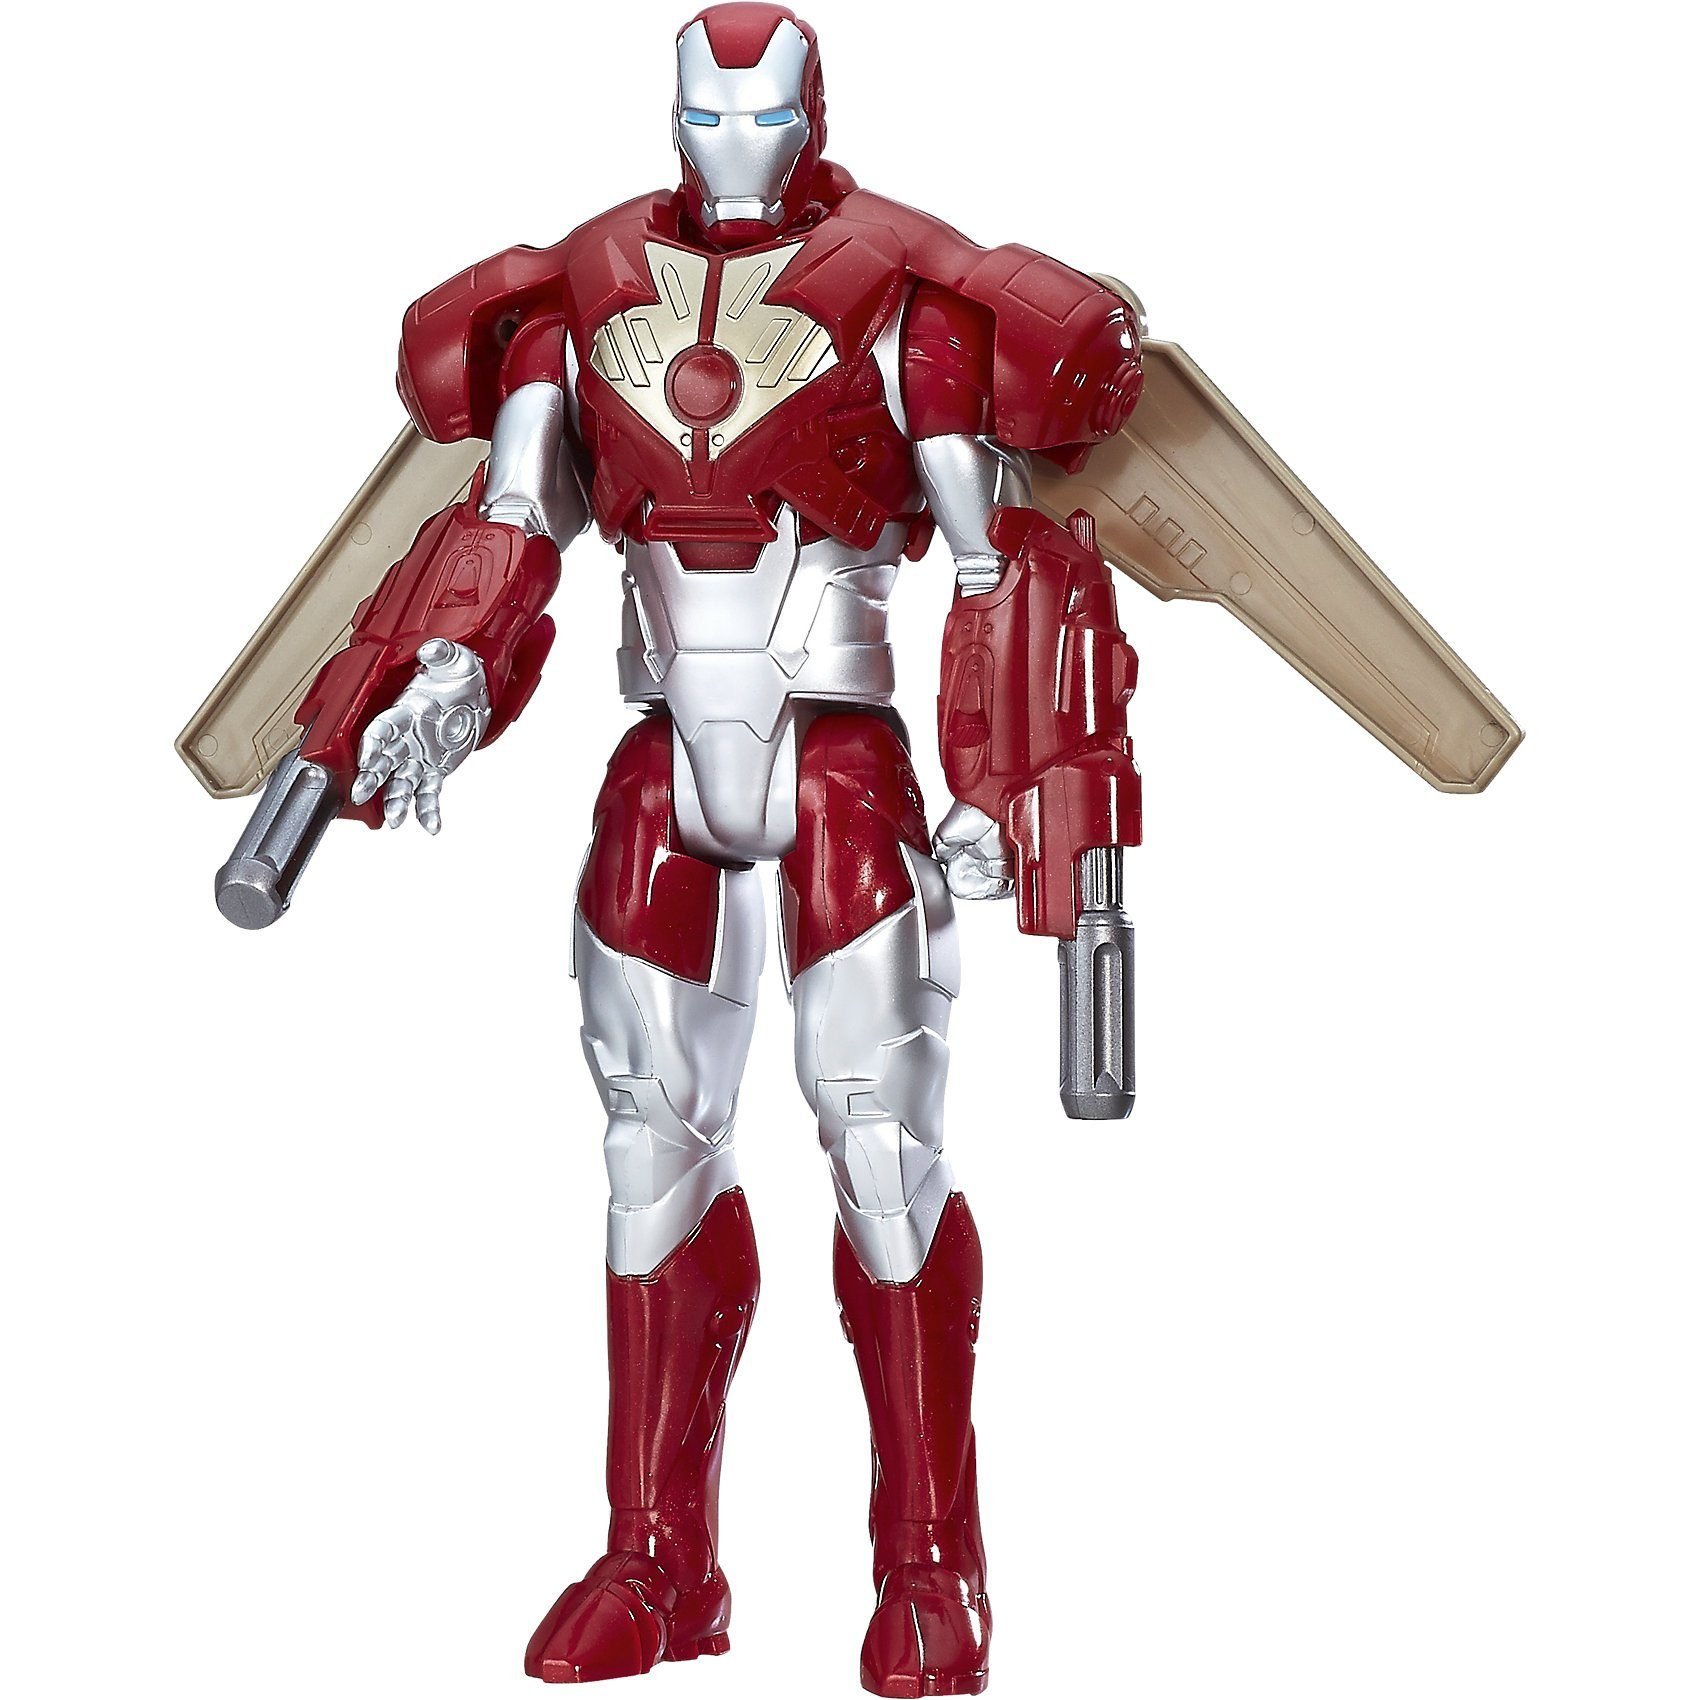 Hasbro Avengers Titan Hero Iron Man Power-Up